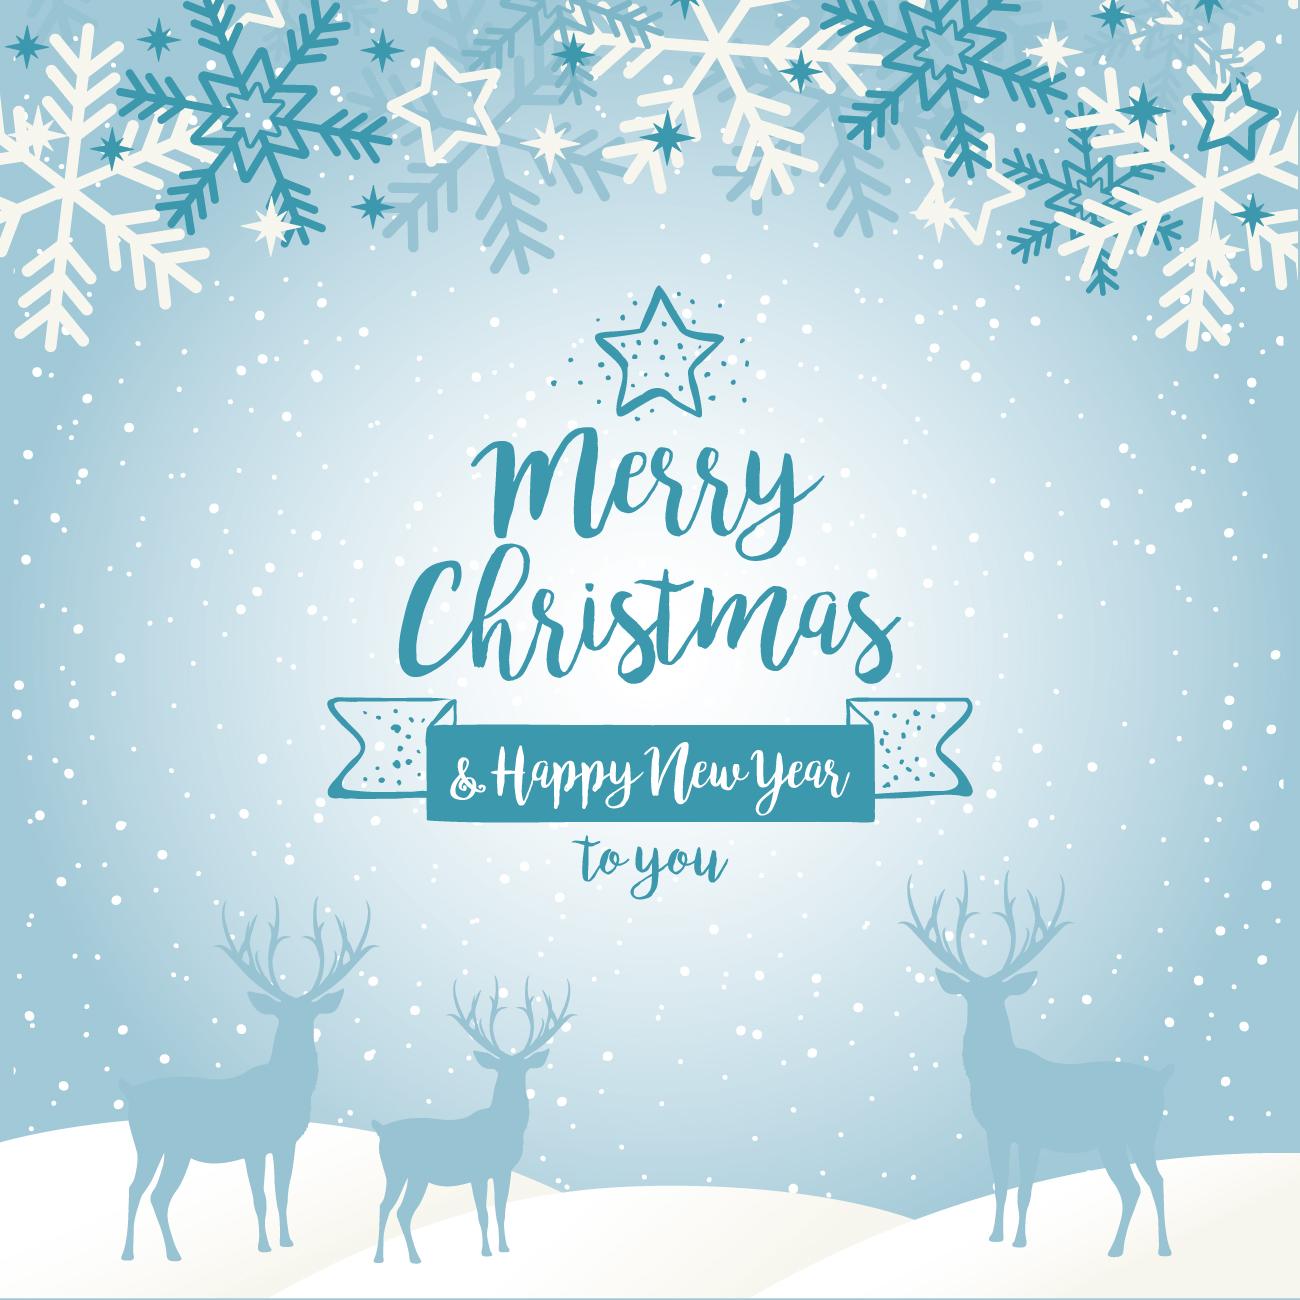 Merry Christmas 2016 Photos